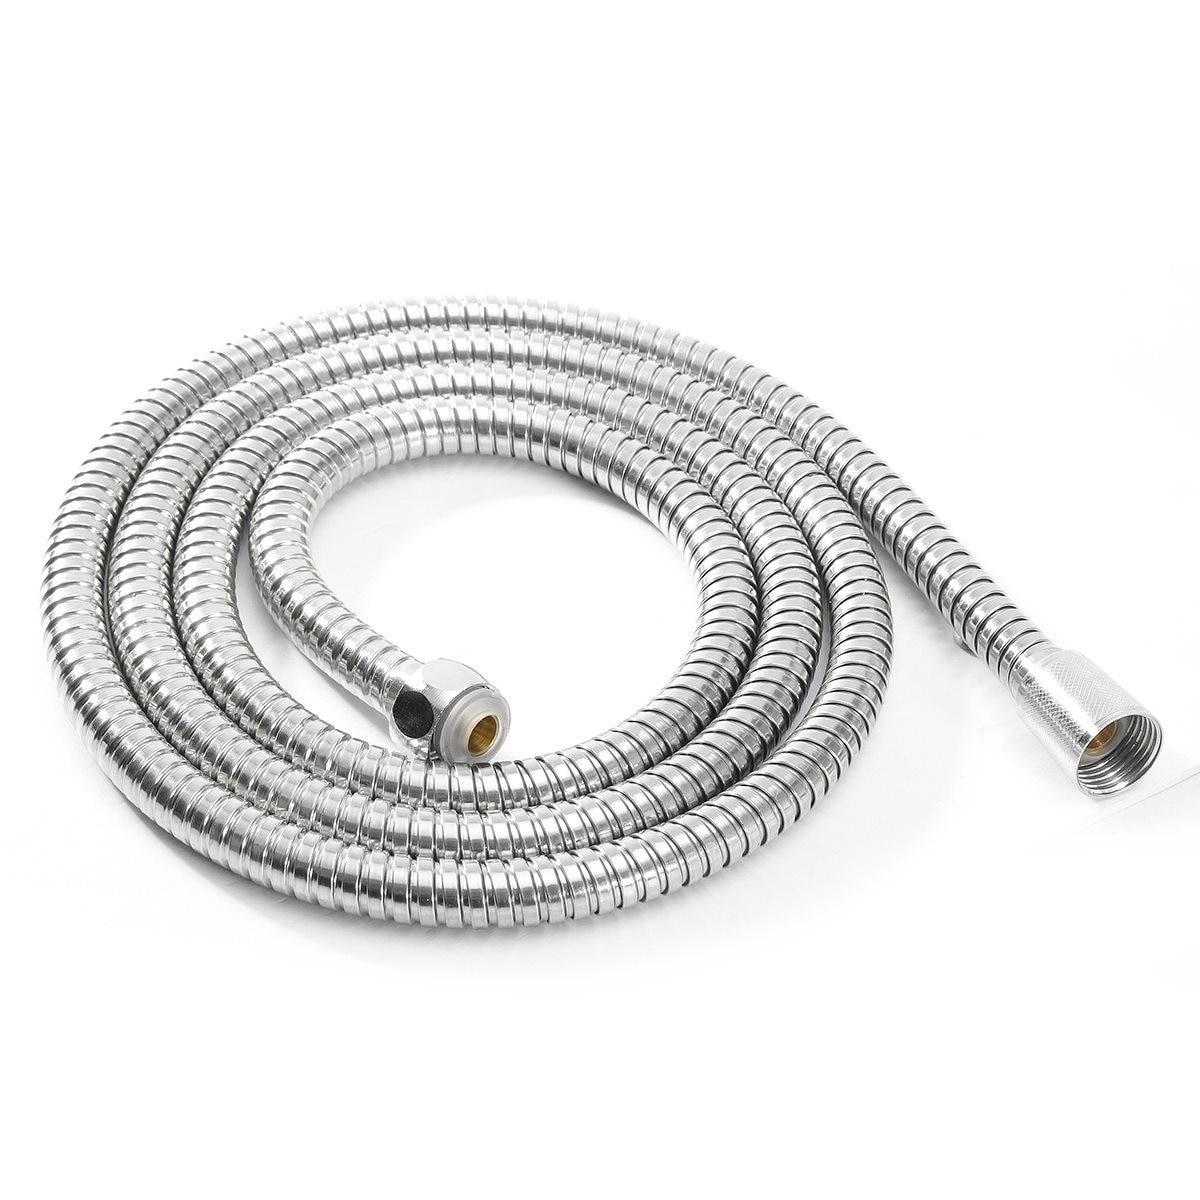 1m/1.5m G1/2 Inch Flexible Shower Hose Plumbing Hoses Stainless Steel Chrome Bathroom Water Head Shower Head Pipe